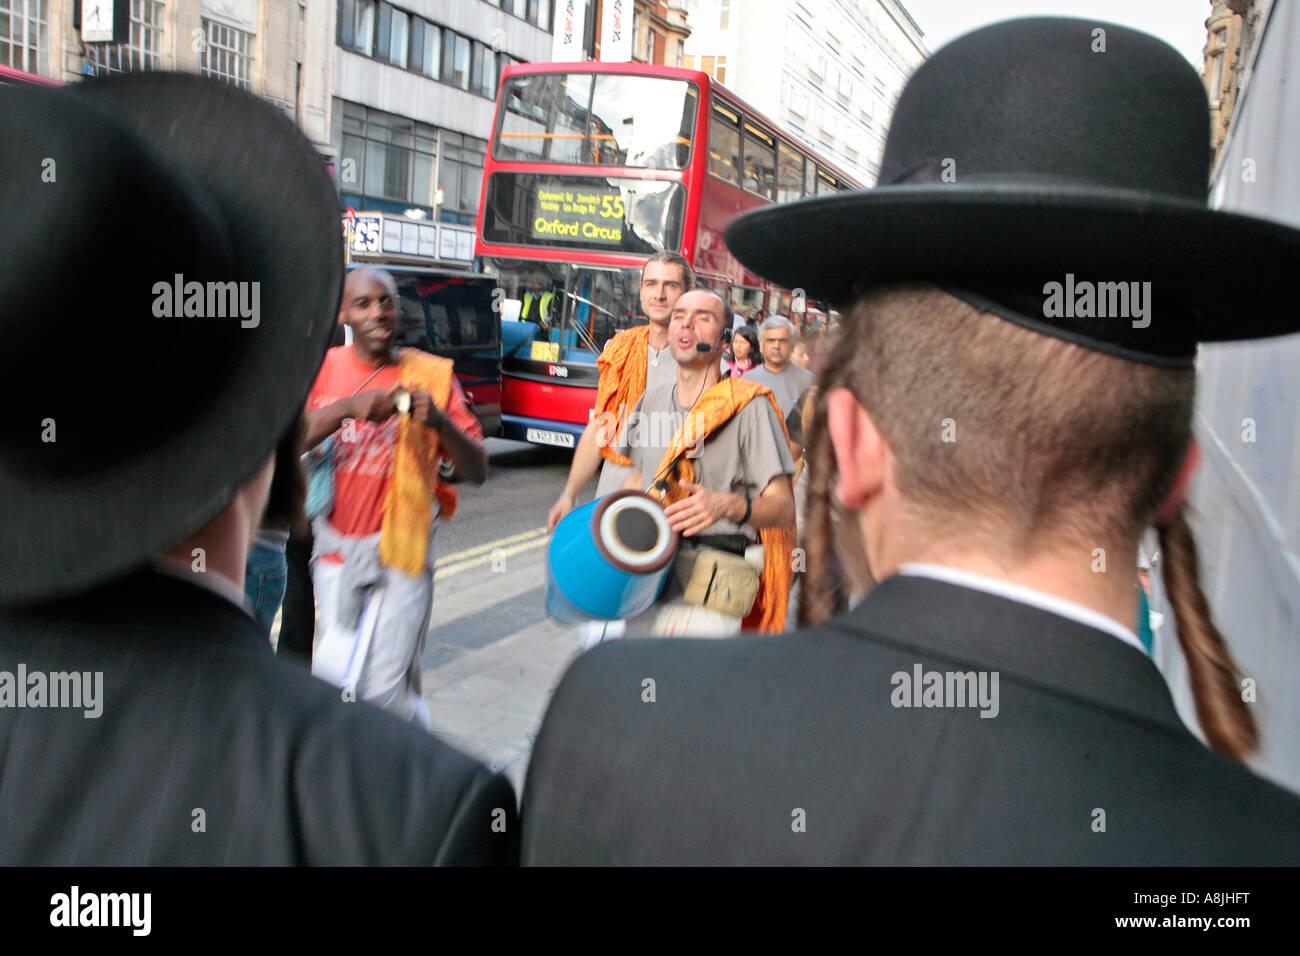 two orthodox jewish men walk past some Hare Krishnas on Oxford Street, London - Stock Image